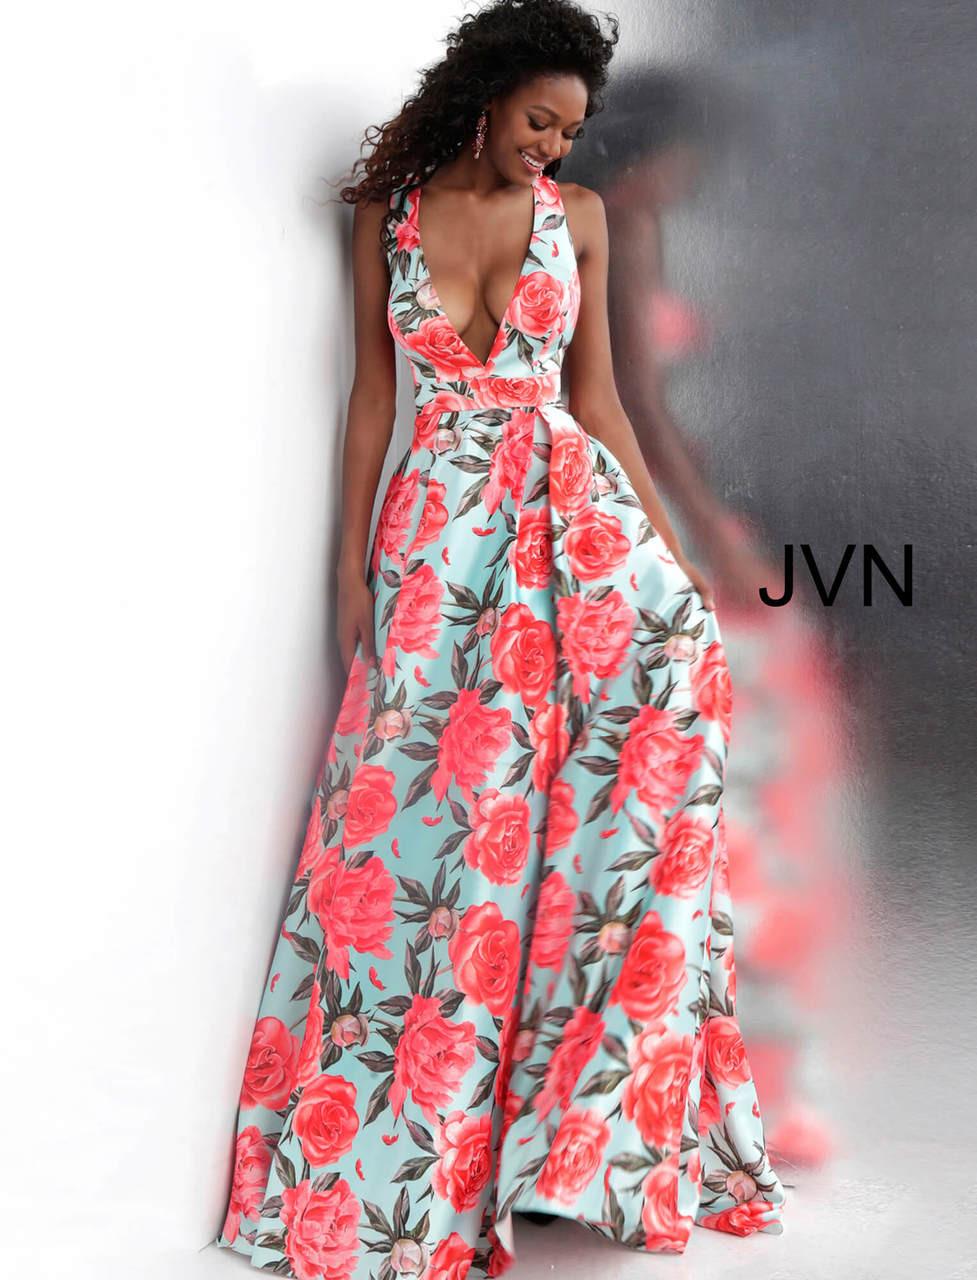 fcf2056f160 JVN66937-TiffanyBlue-front  00425.1549439670.jpg c 2 imbypass on